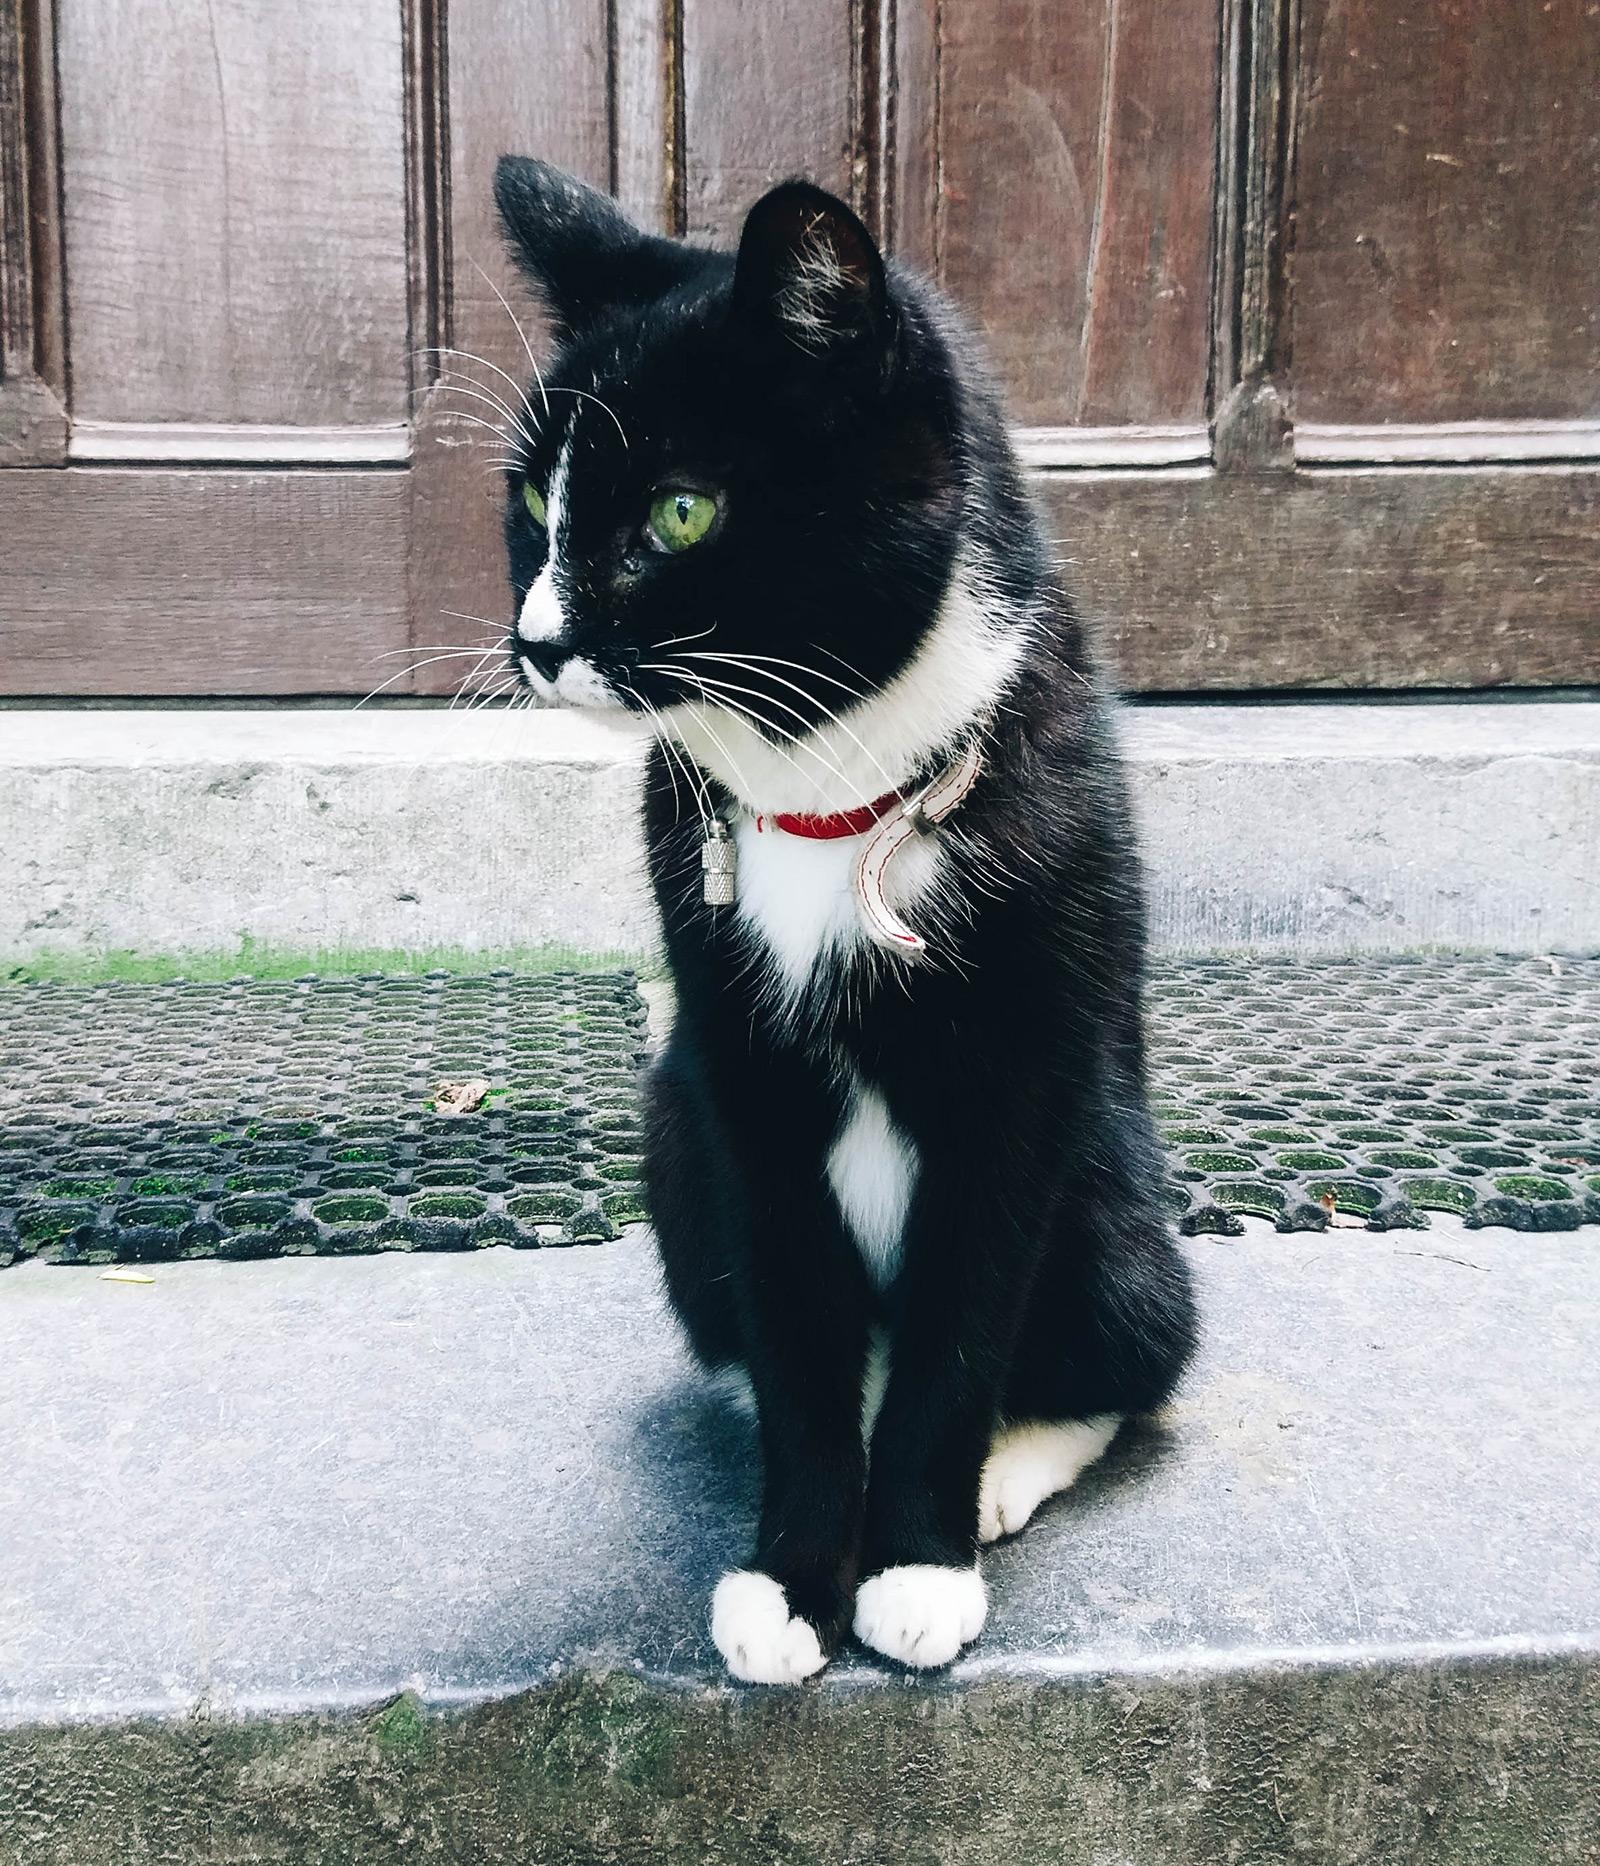 acourseindying_nijmegen_cemetery_ubbergen_refter_cat_03-2